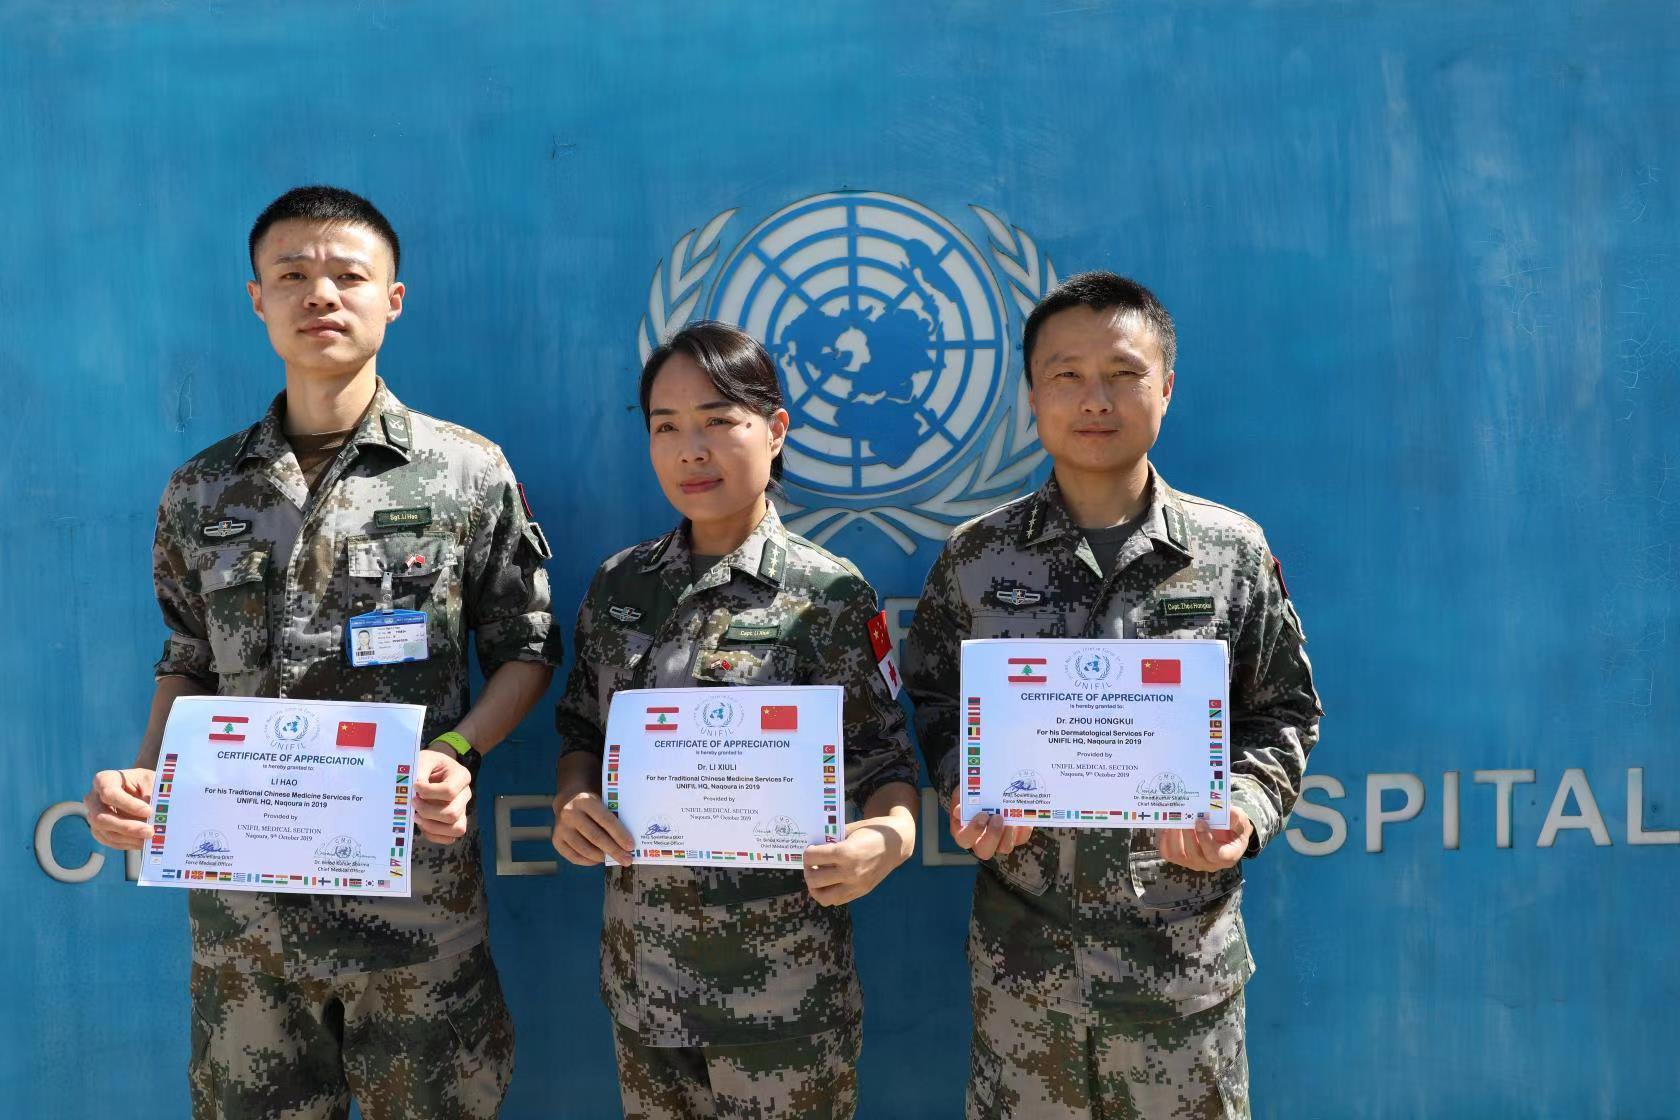 Chinese medicos awarded in Lebanon